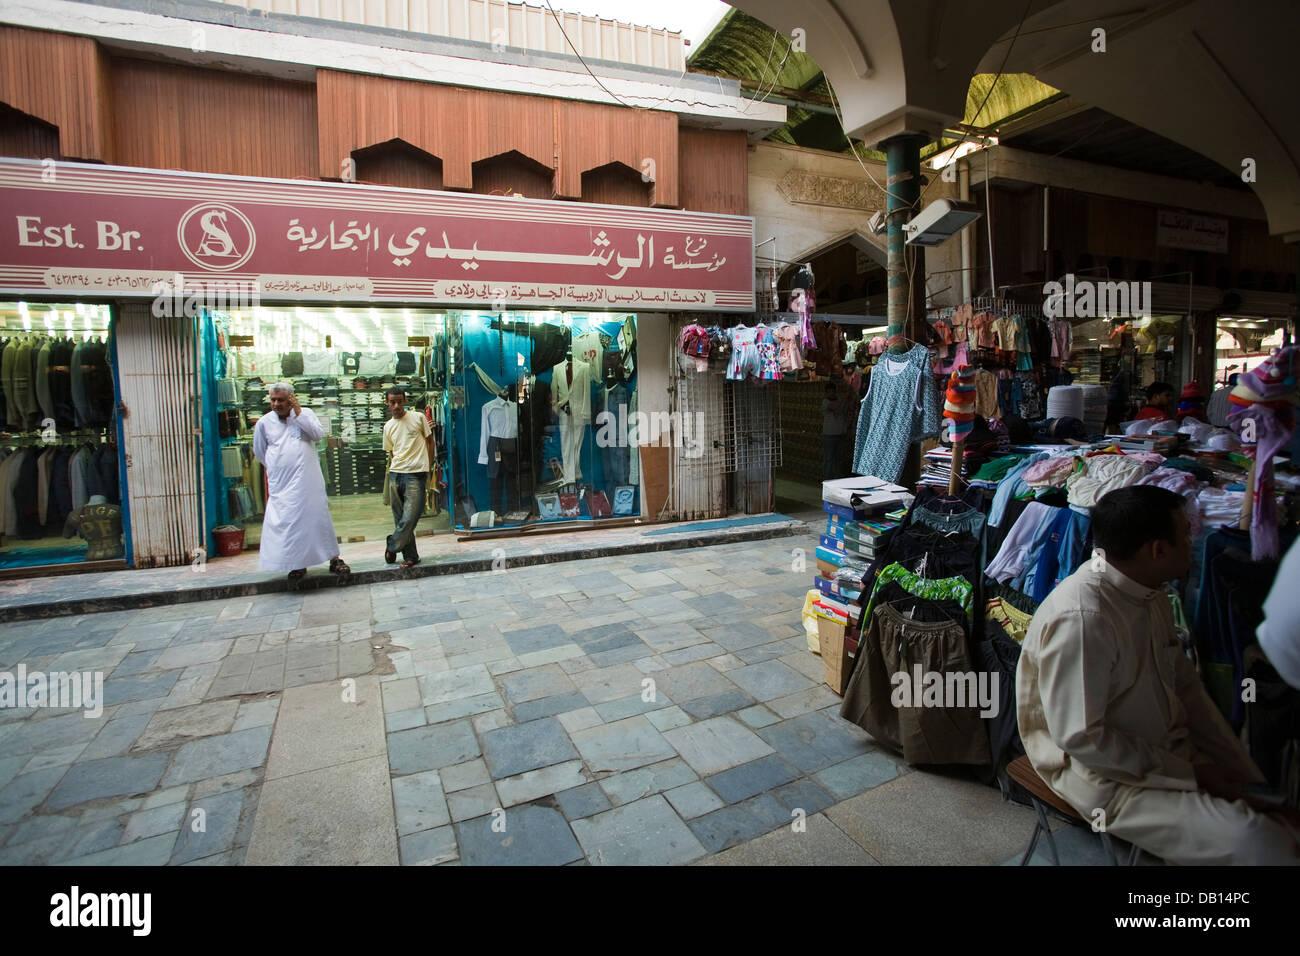 04db517850d Souq al-Alawi market in Old Jeddah (Al-Balad), Jeddah, Saudi Arabia ...